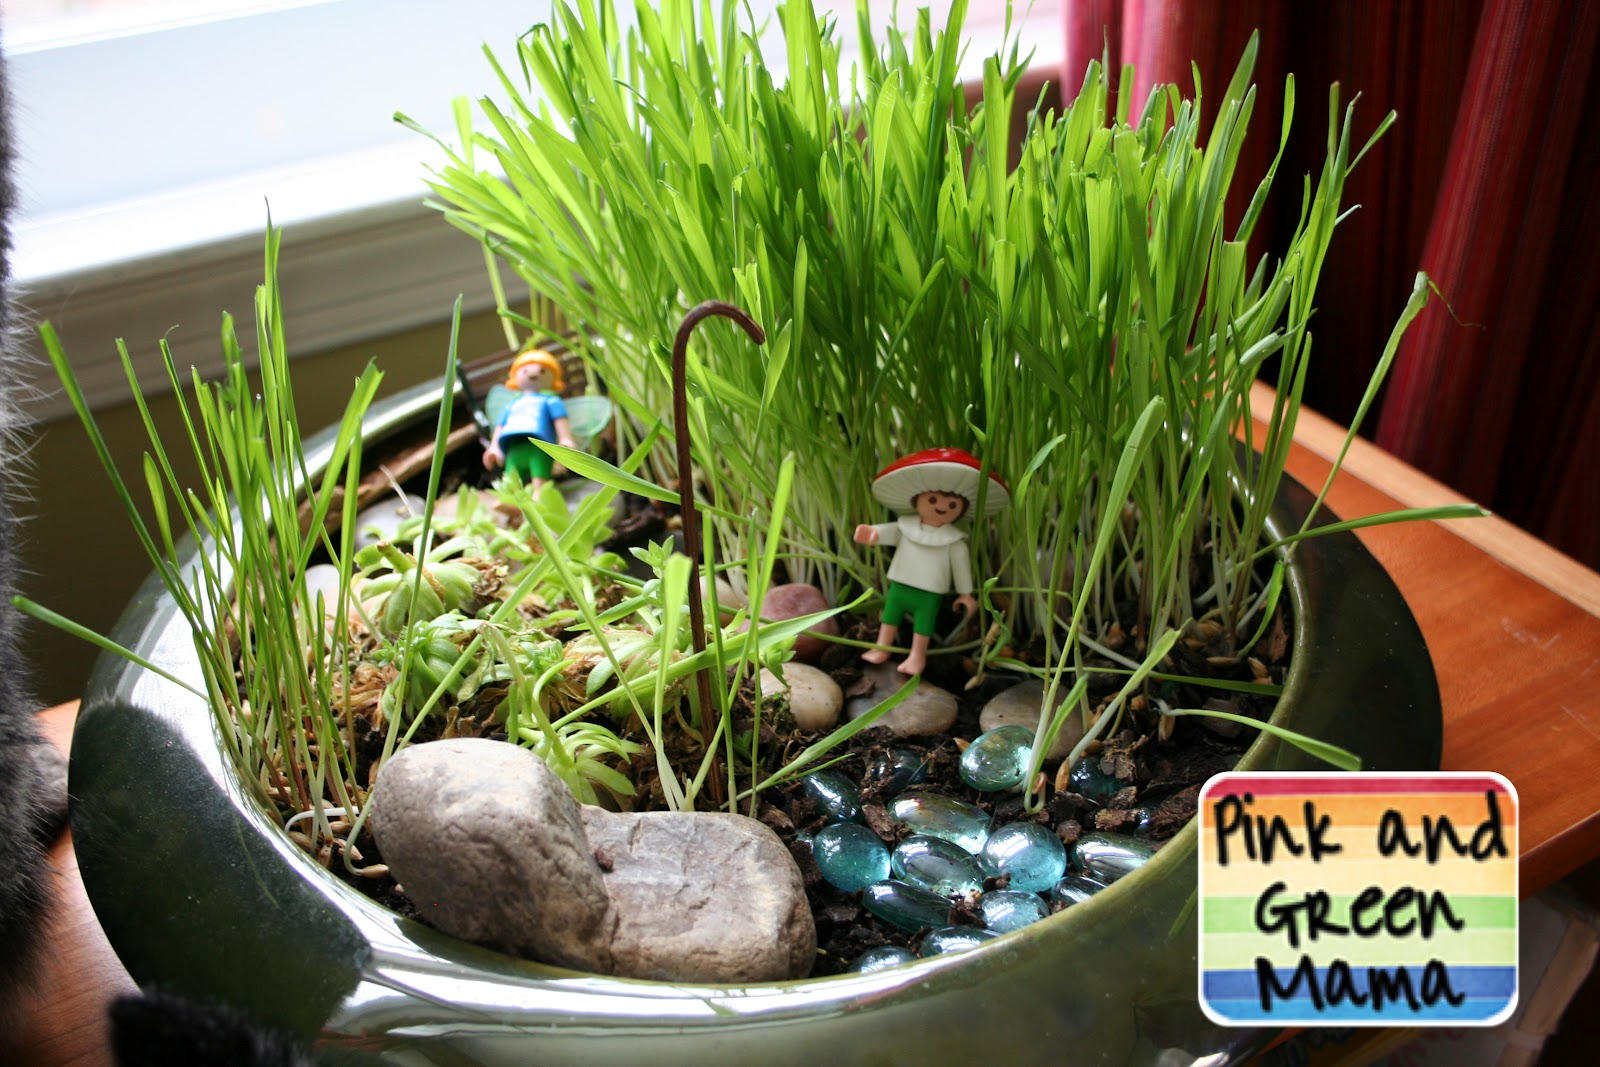 pink and green mama indoor cat fairy garden. Black Bedroom Furniture Sets. Home Design Ideas